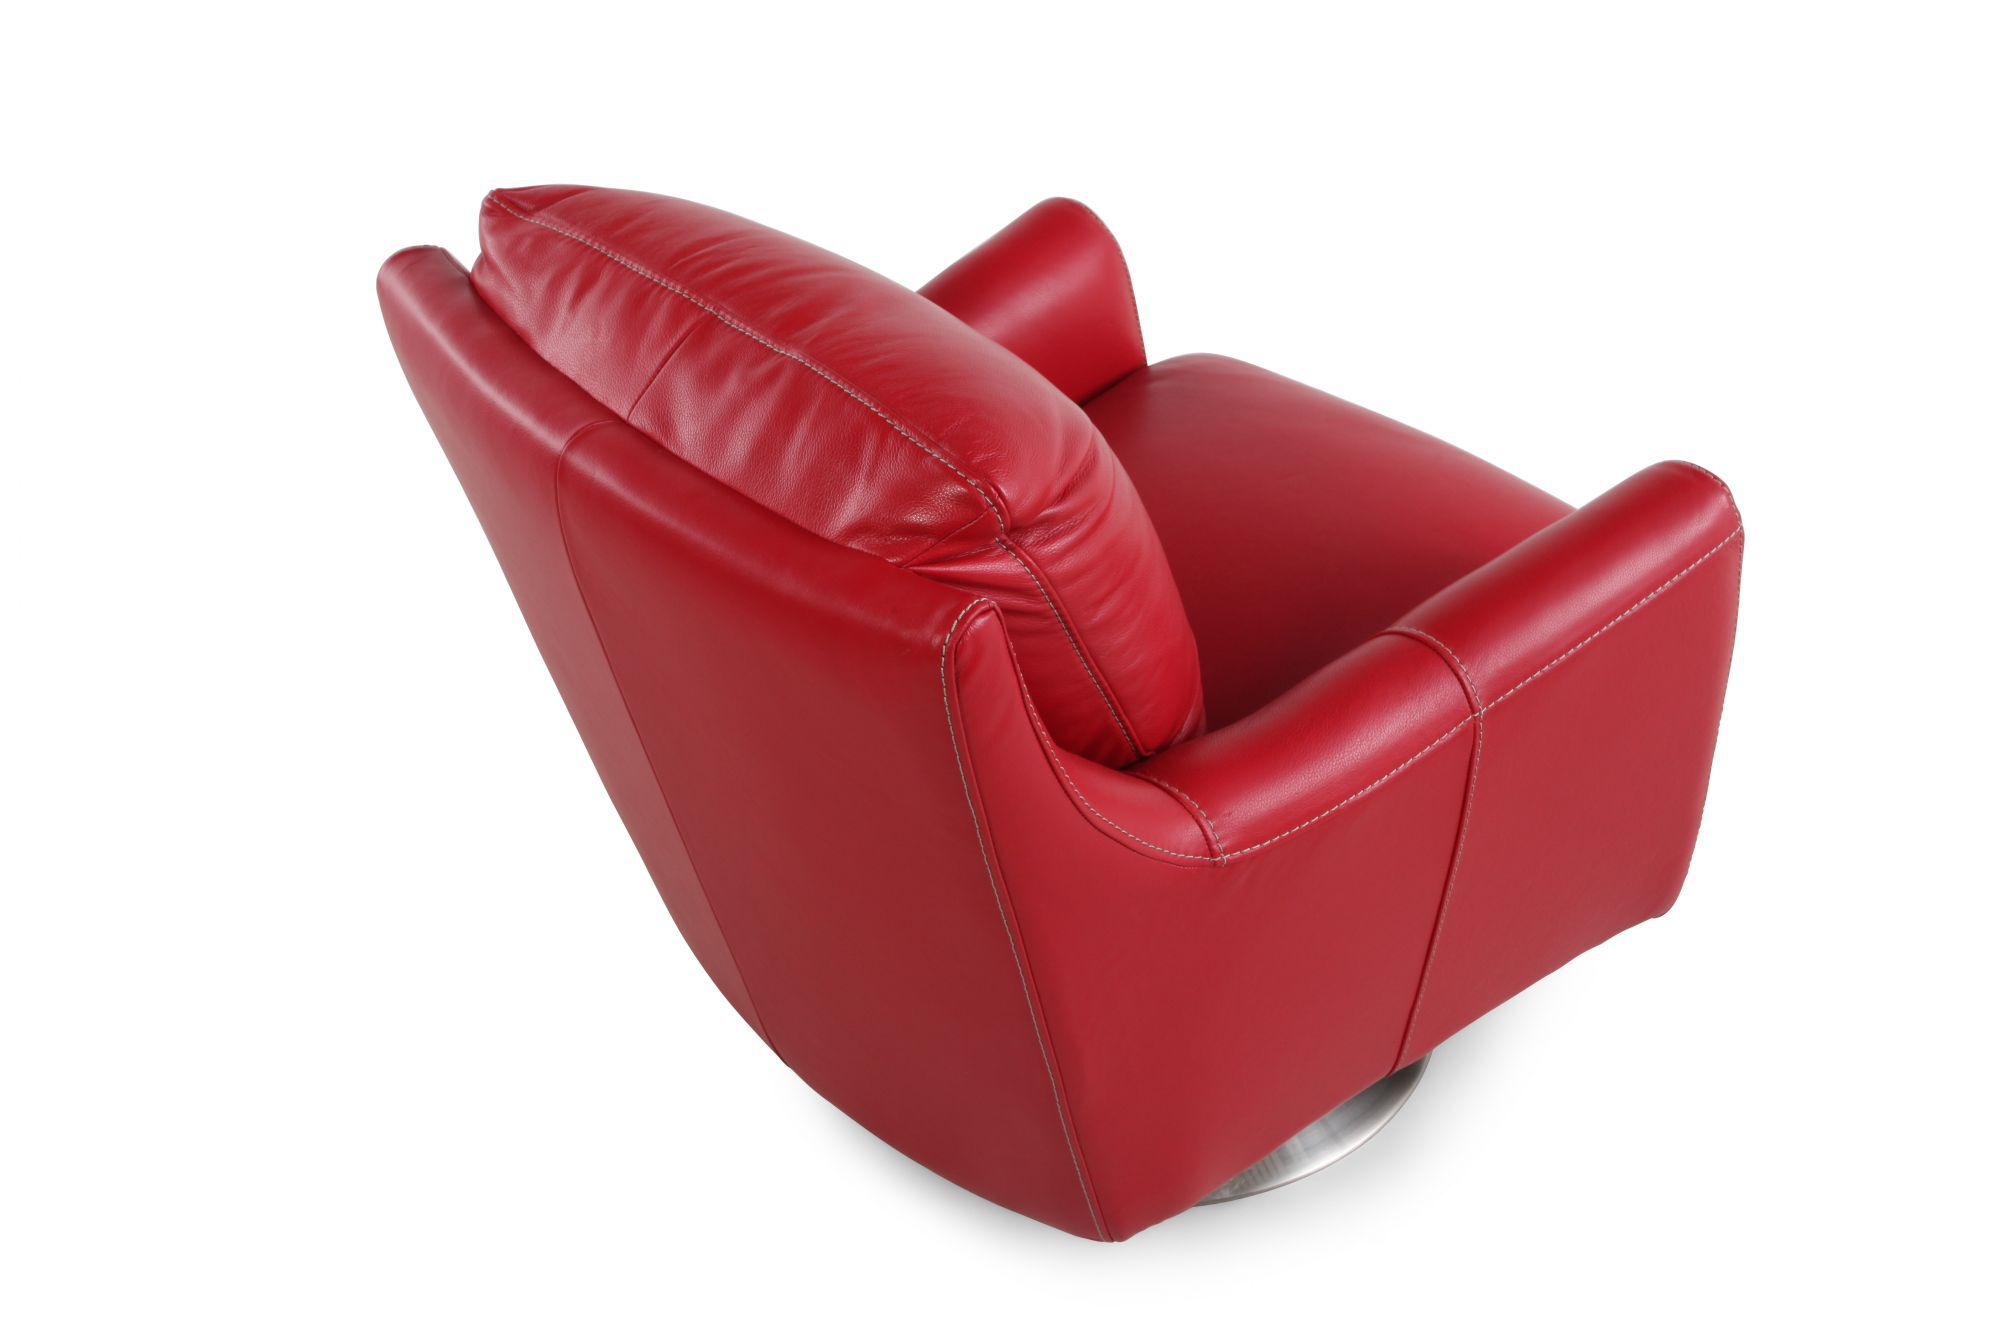 la z boy swivel chair mid century modern slipper xavier red leather mathis brothers